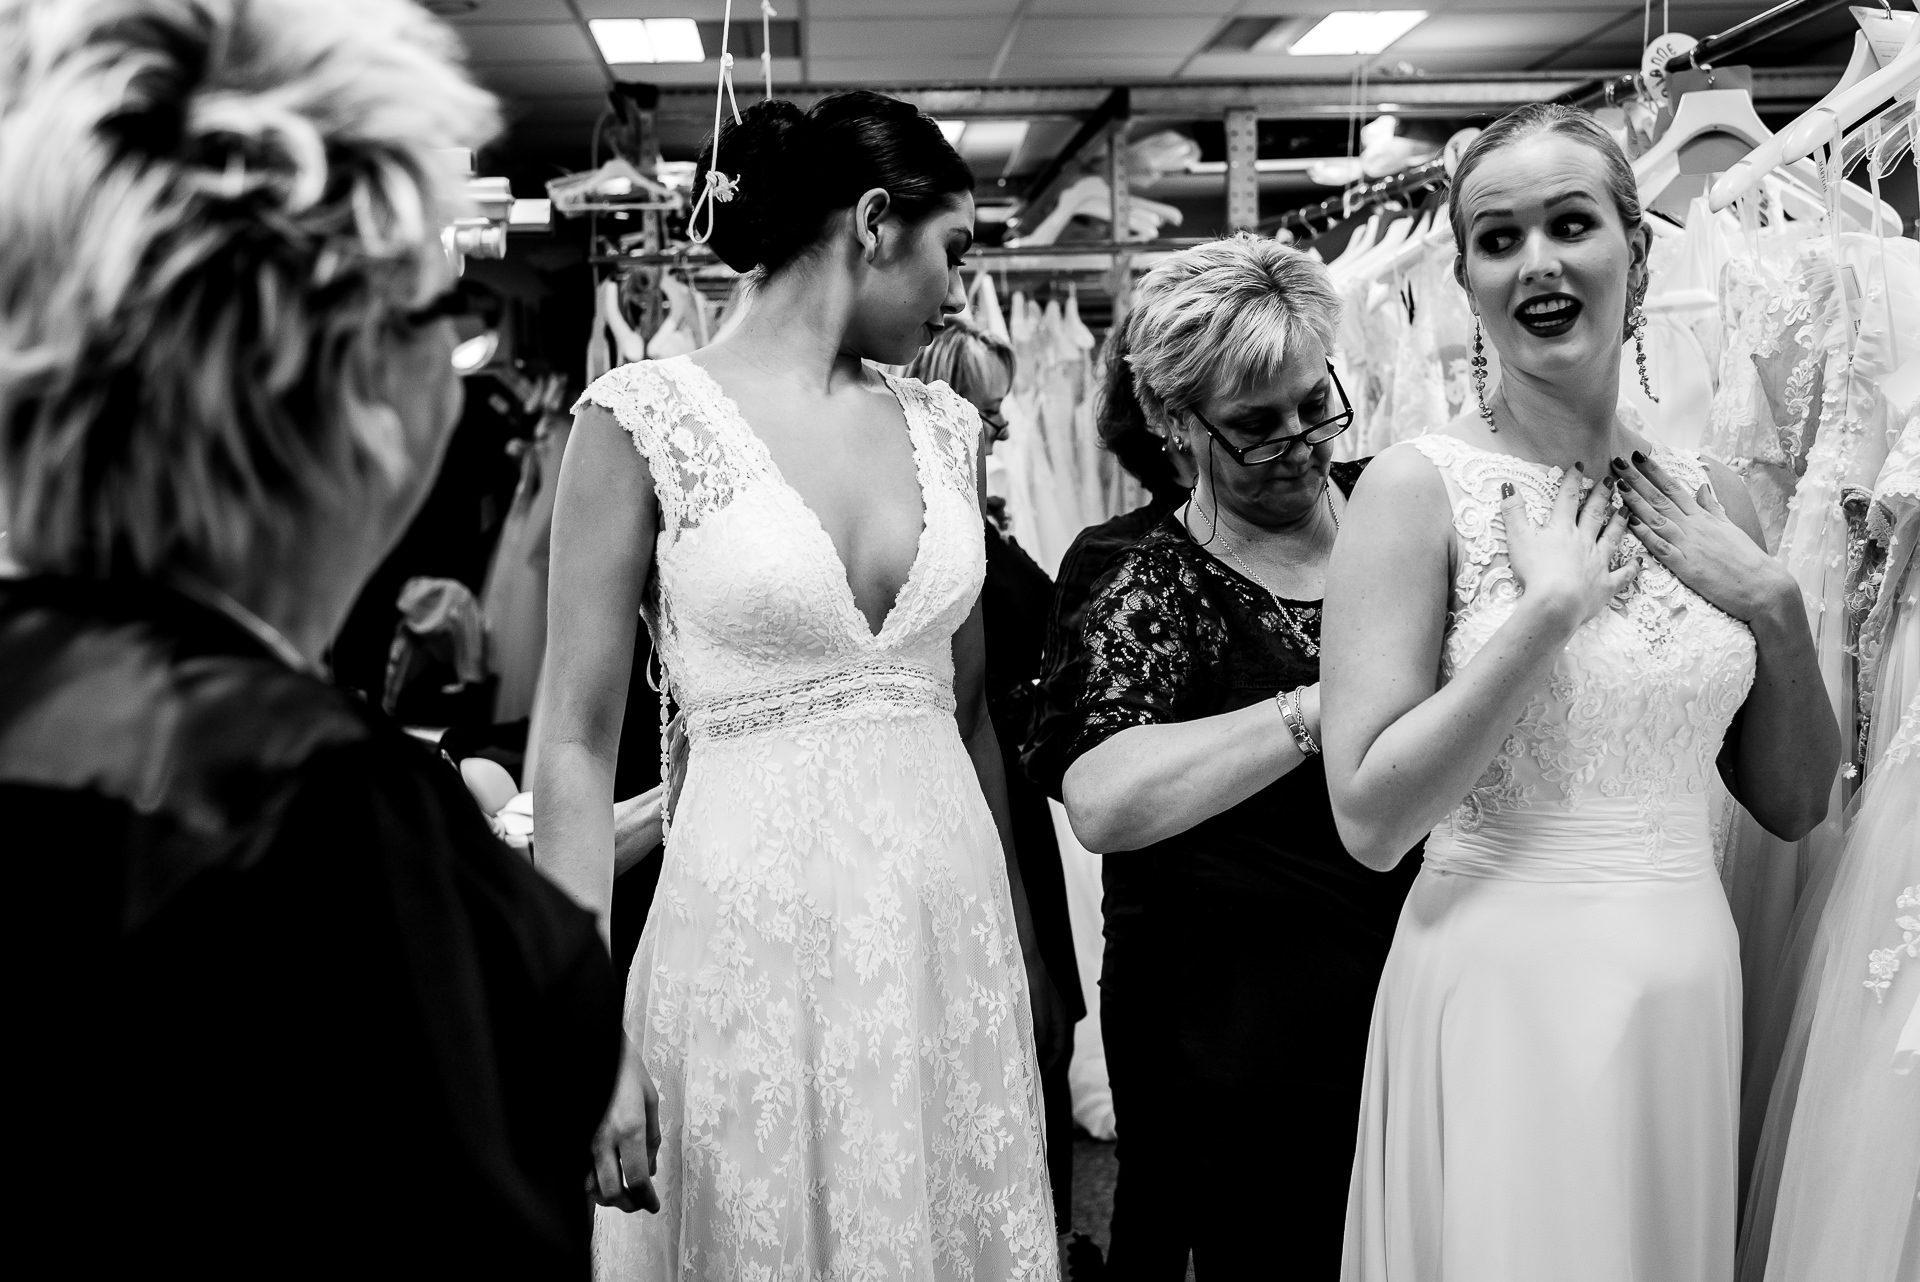 Bruidsjurken Amersfoort.Backstage Reportage Huisshow Valkengoed Amersfoort